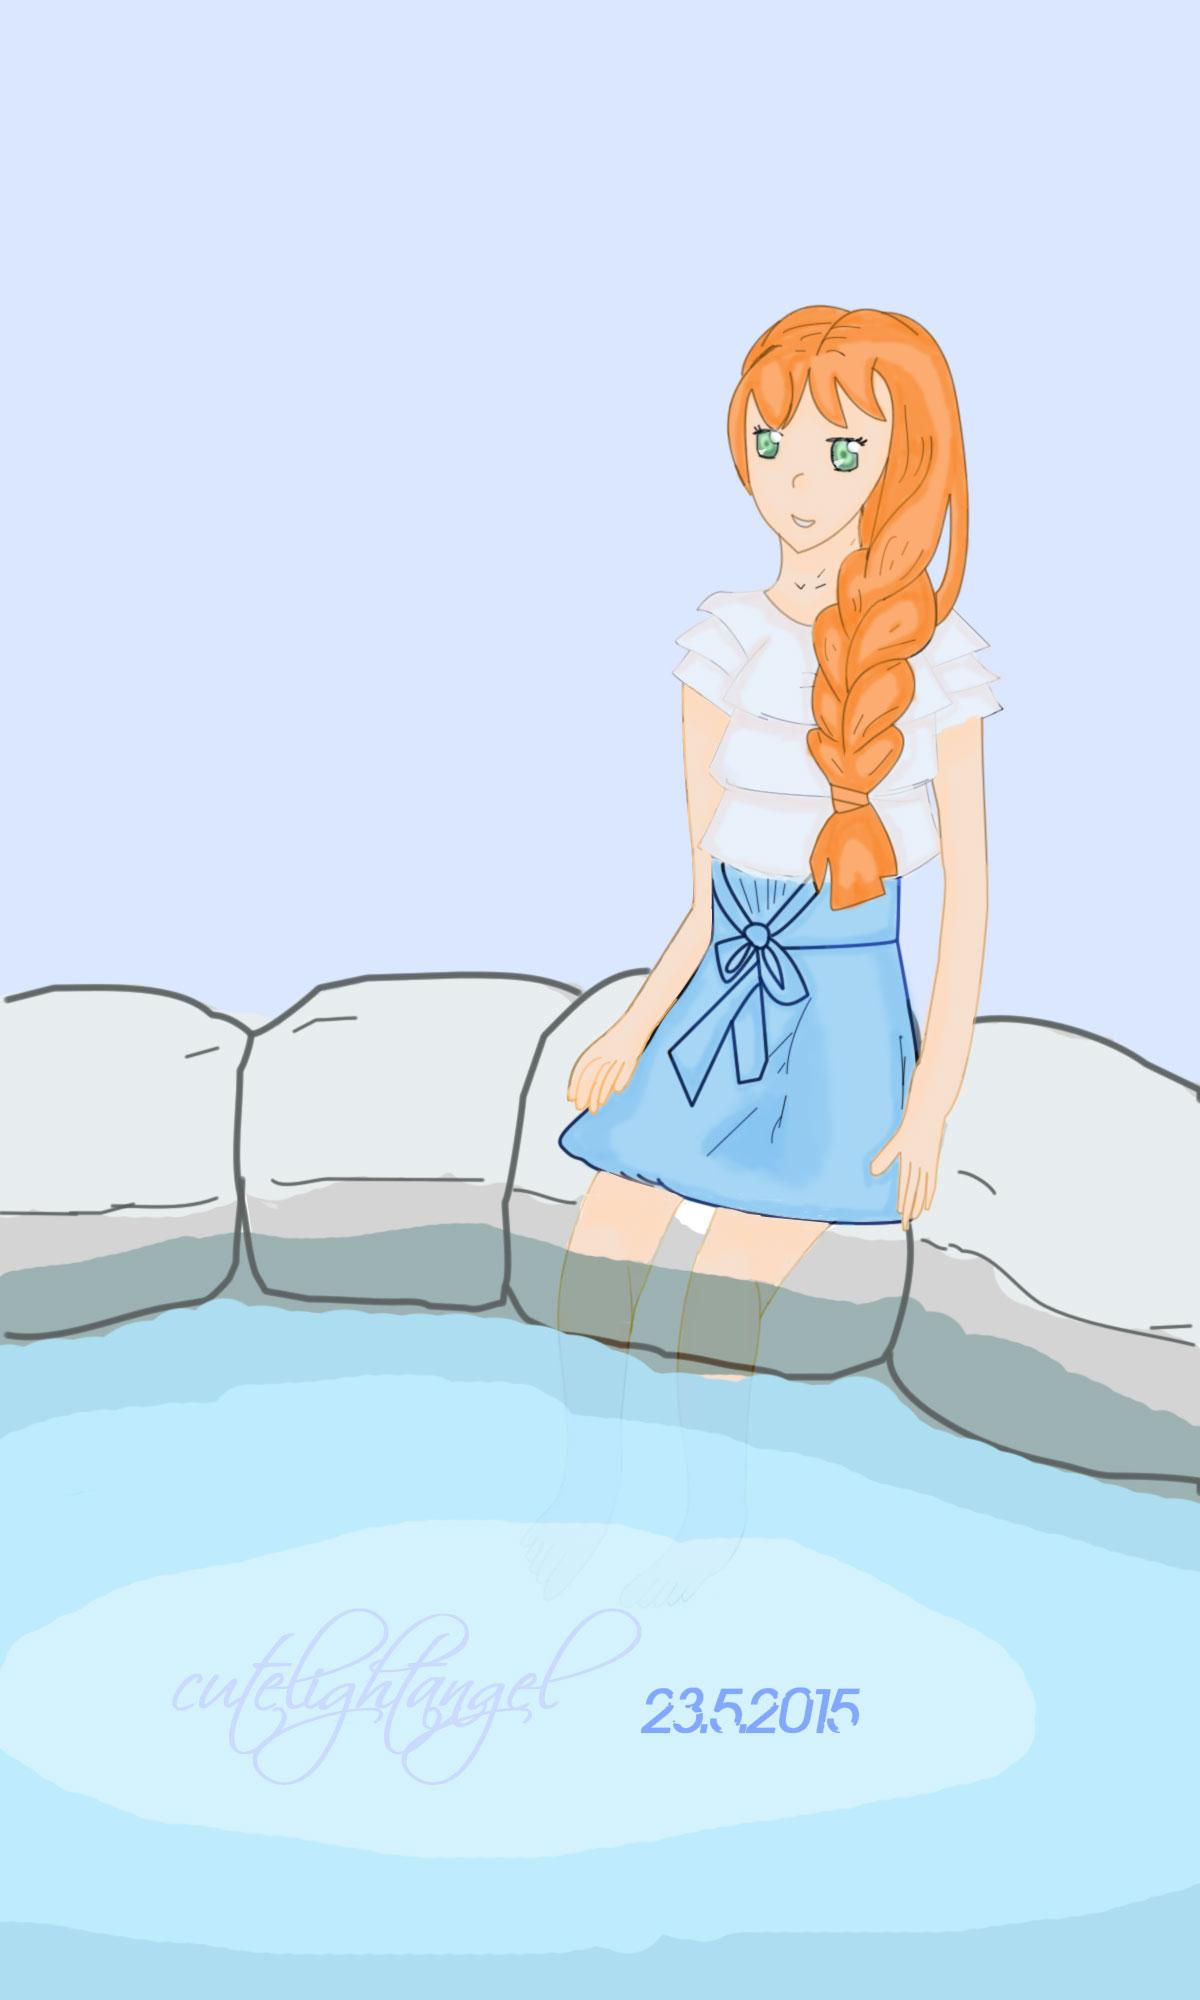 Girl relaxing at pool by cutelightangel